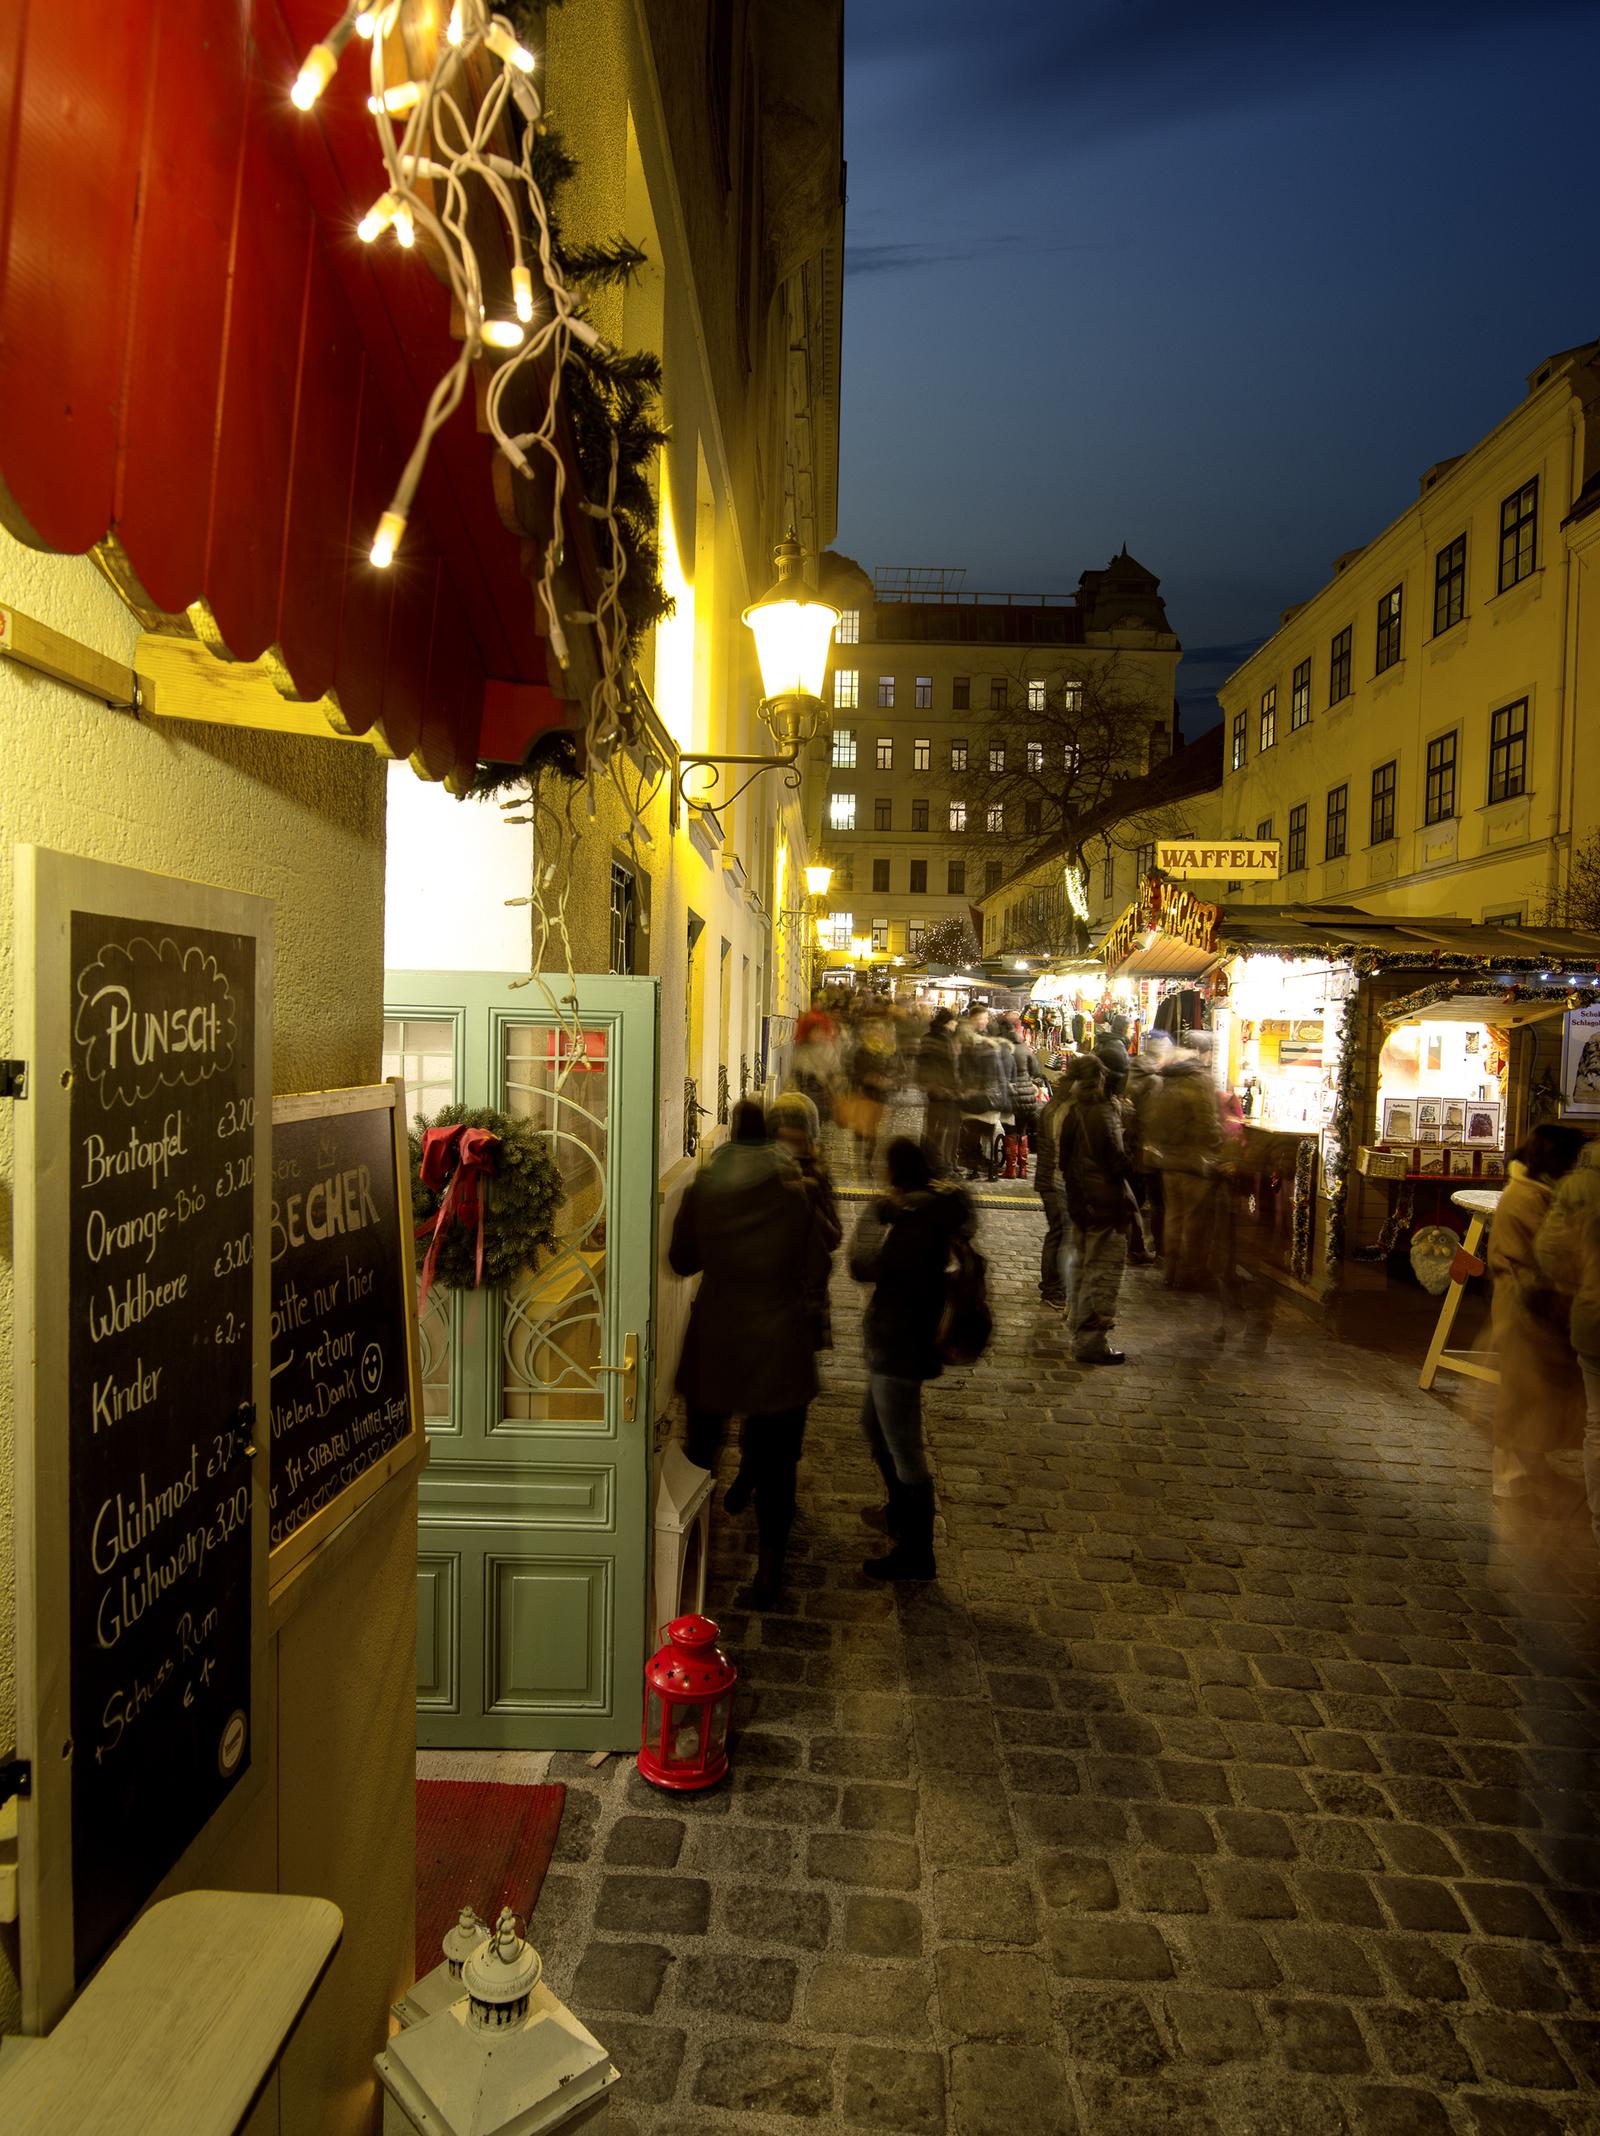 Wien Tourismus / Christian Stemper